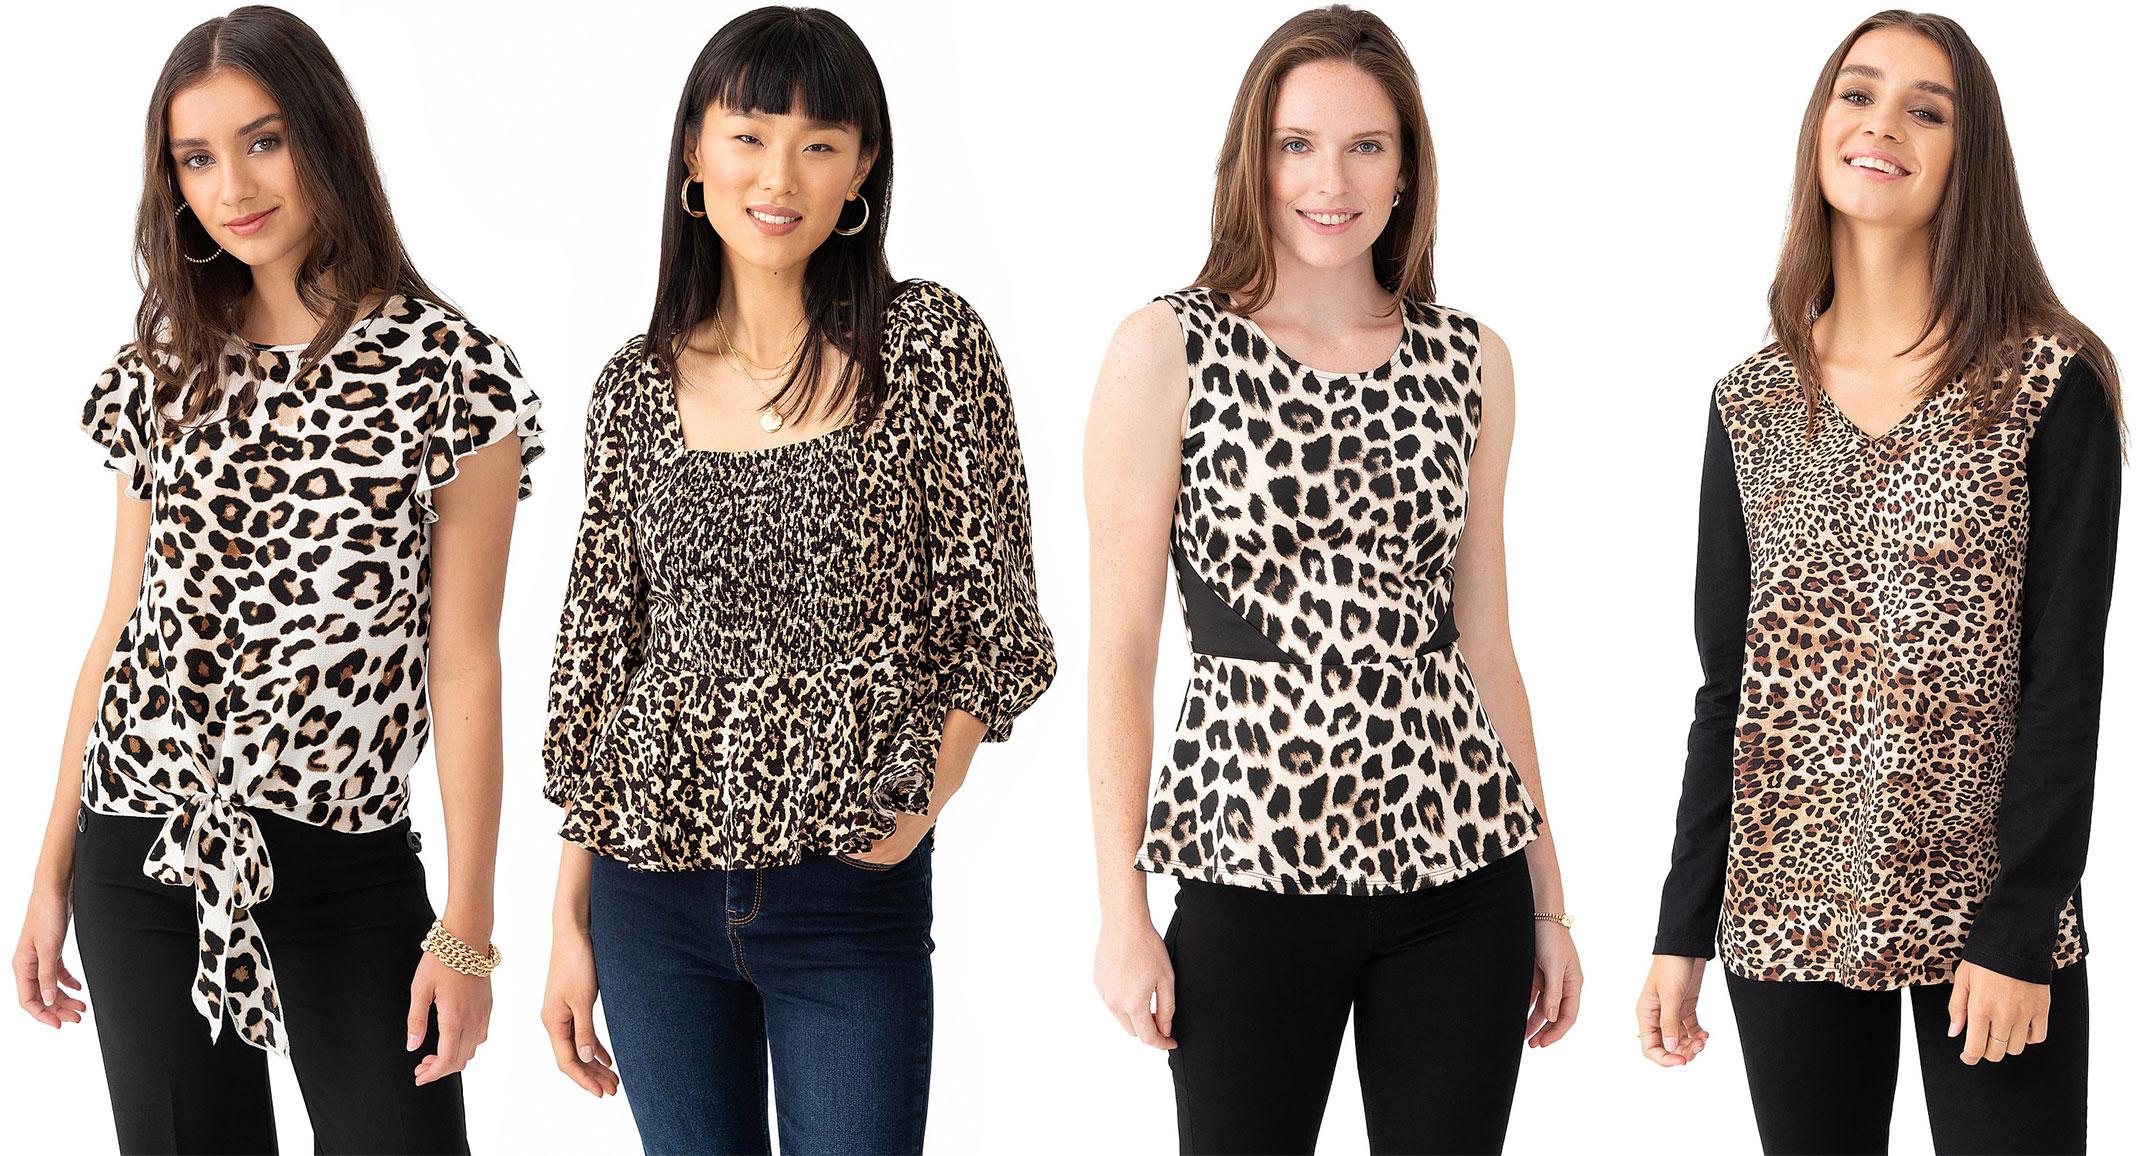 Leopard Print Tops.jpg